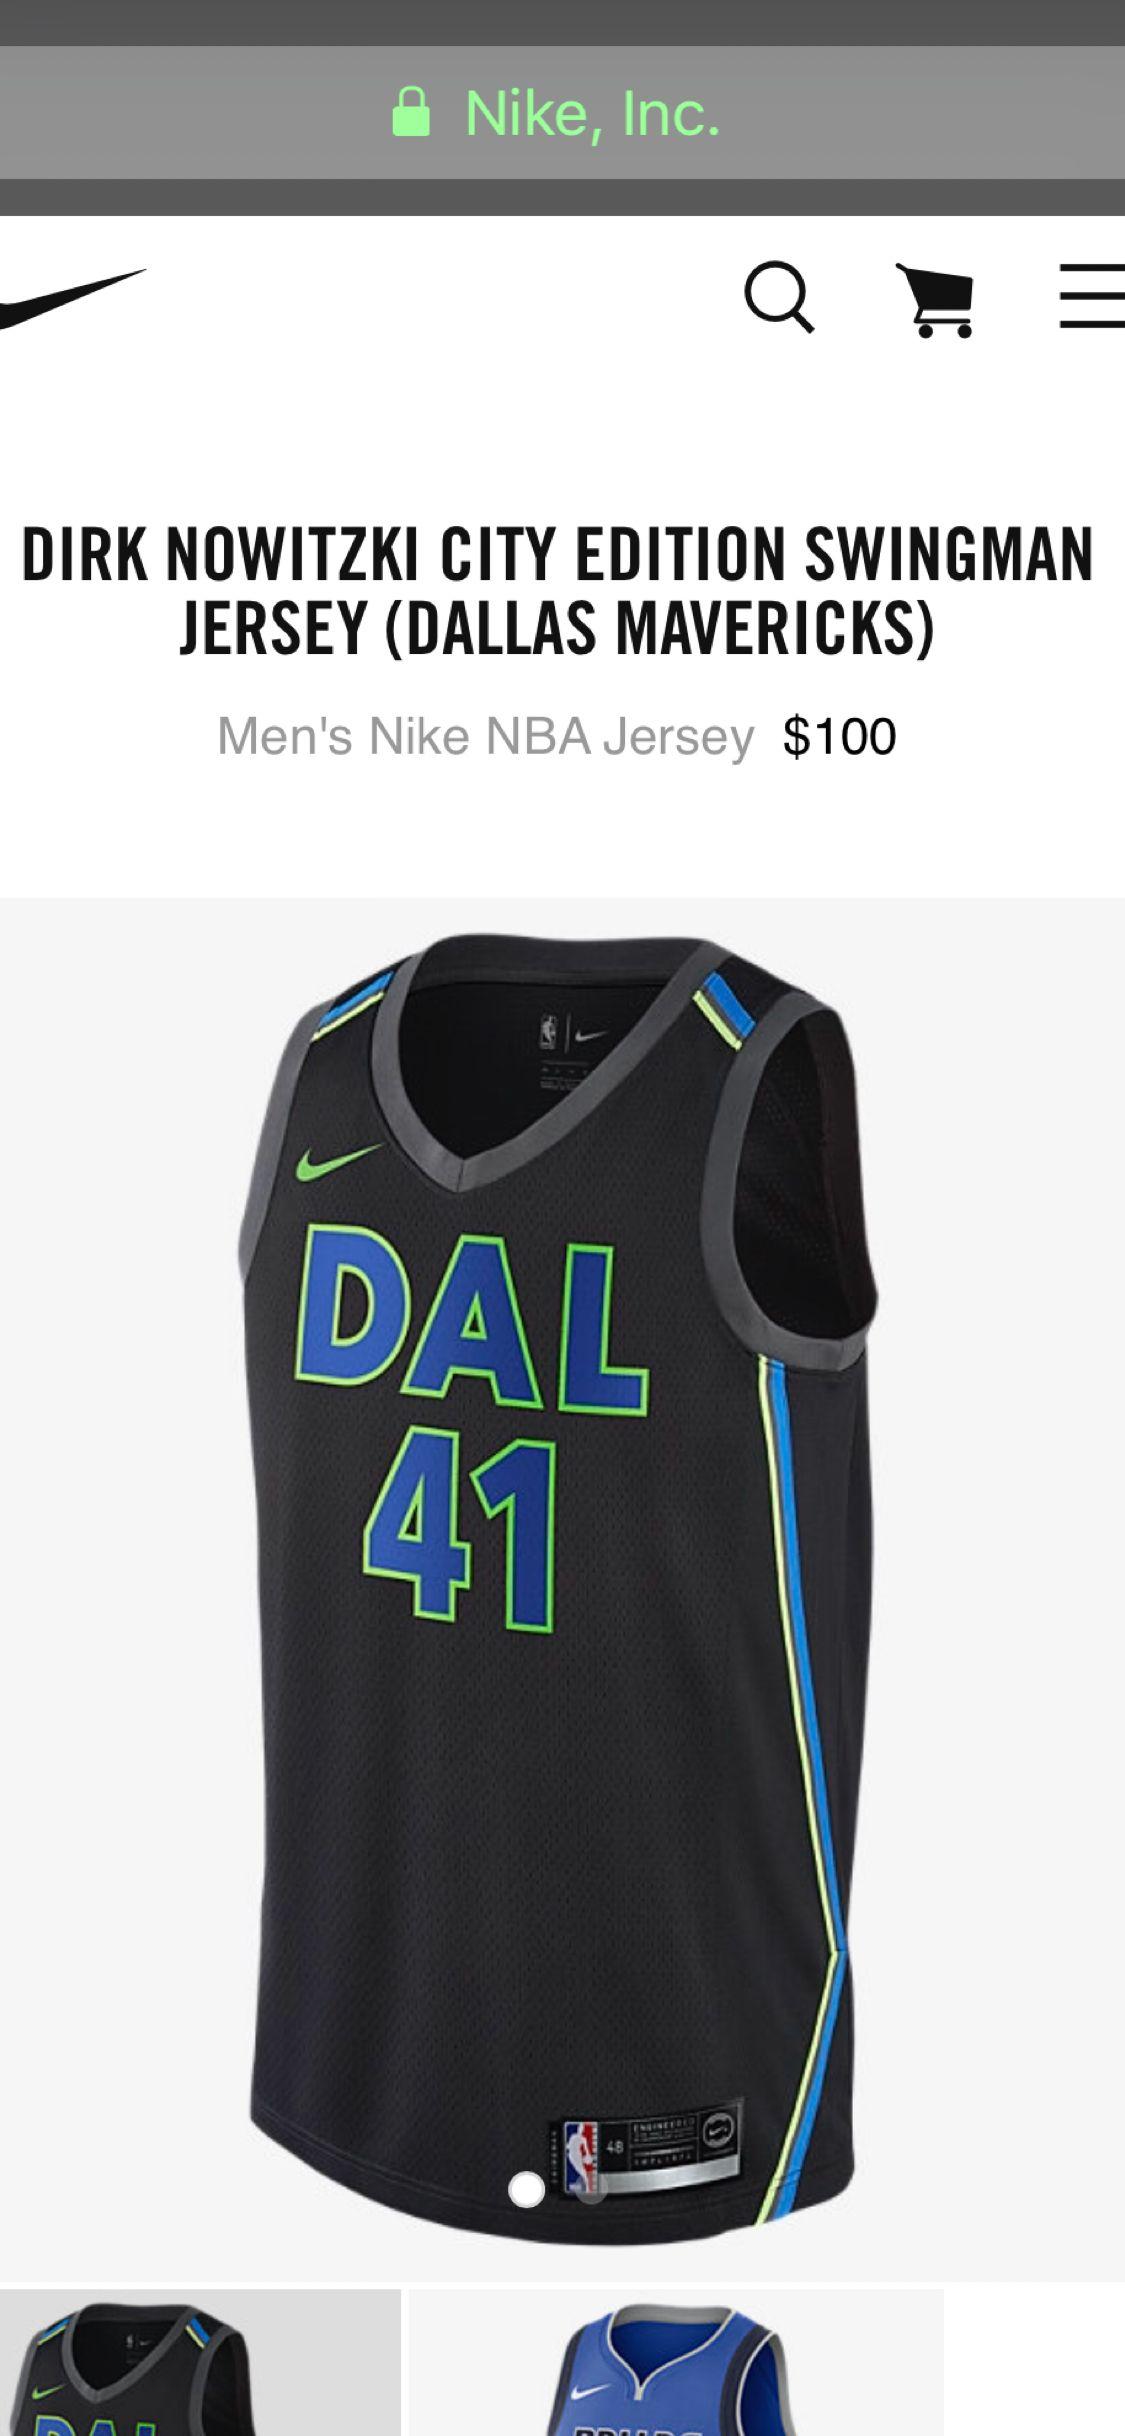 new product e8d4b c6963 Dallas Swingman jersey city edition - Dirk Nowitzki ...